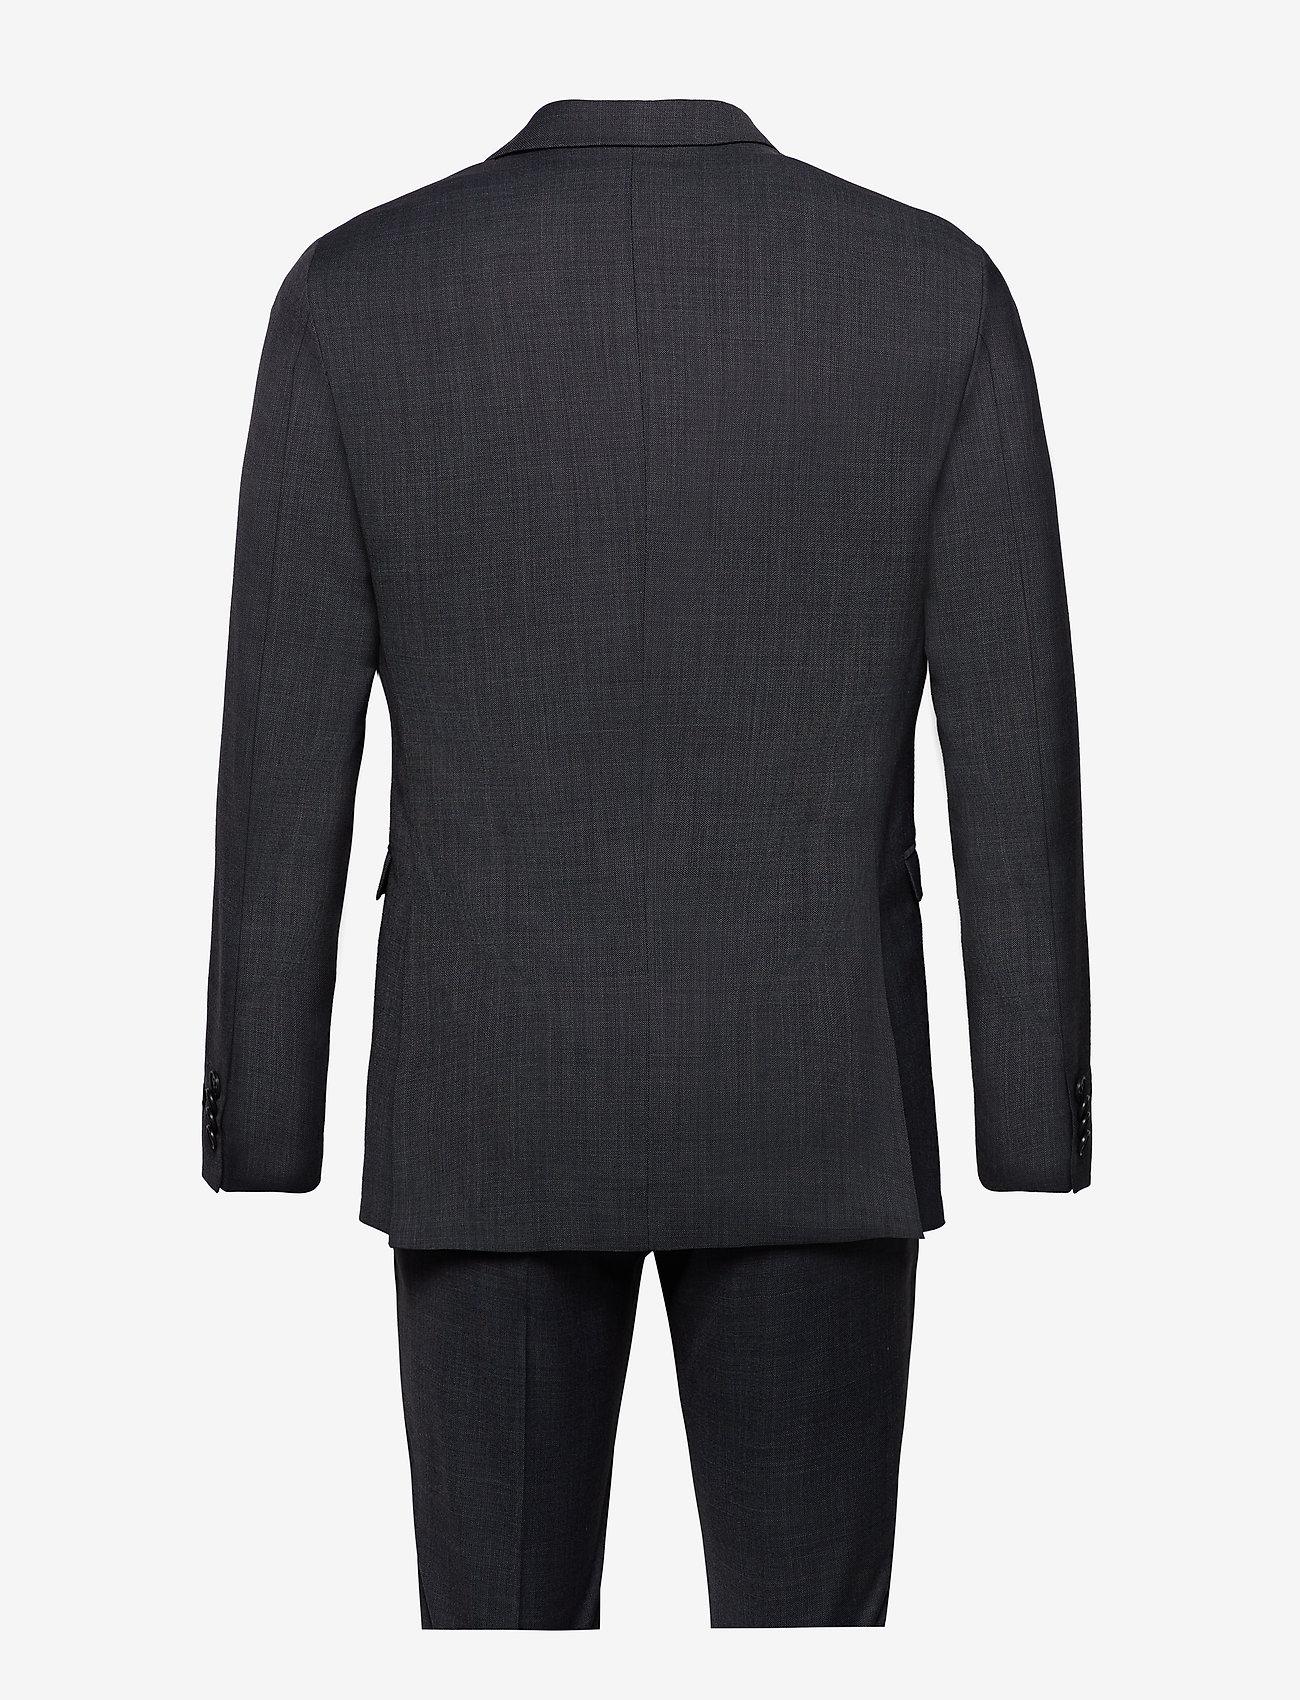 Jack & Jones - JPRSOLARIS SUIT - single breasted suits - dark grey